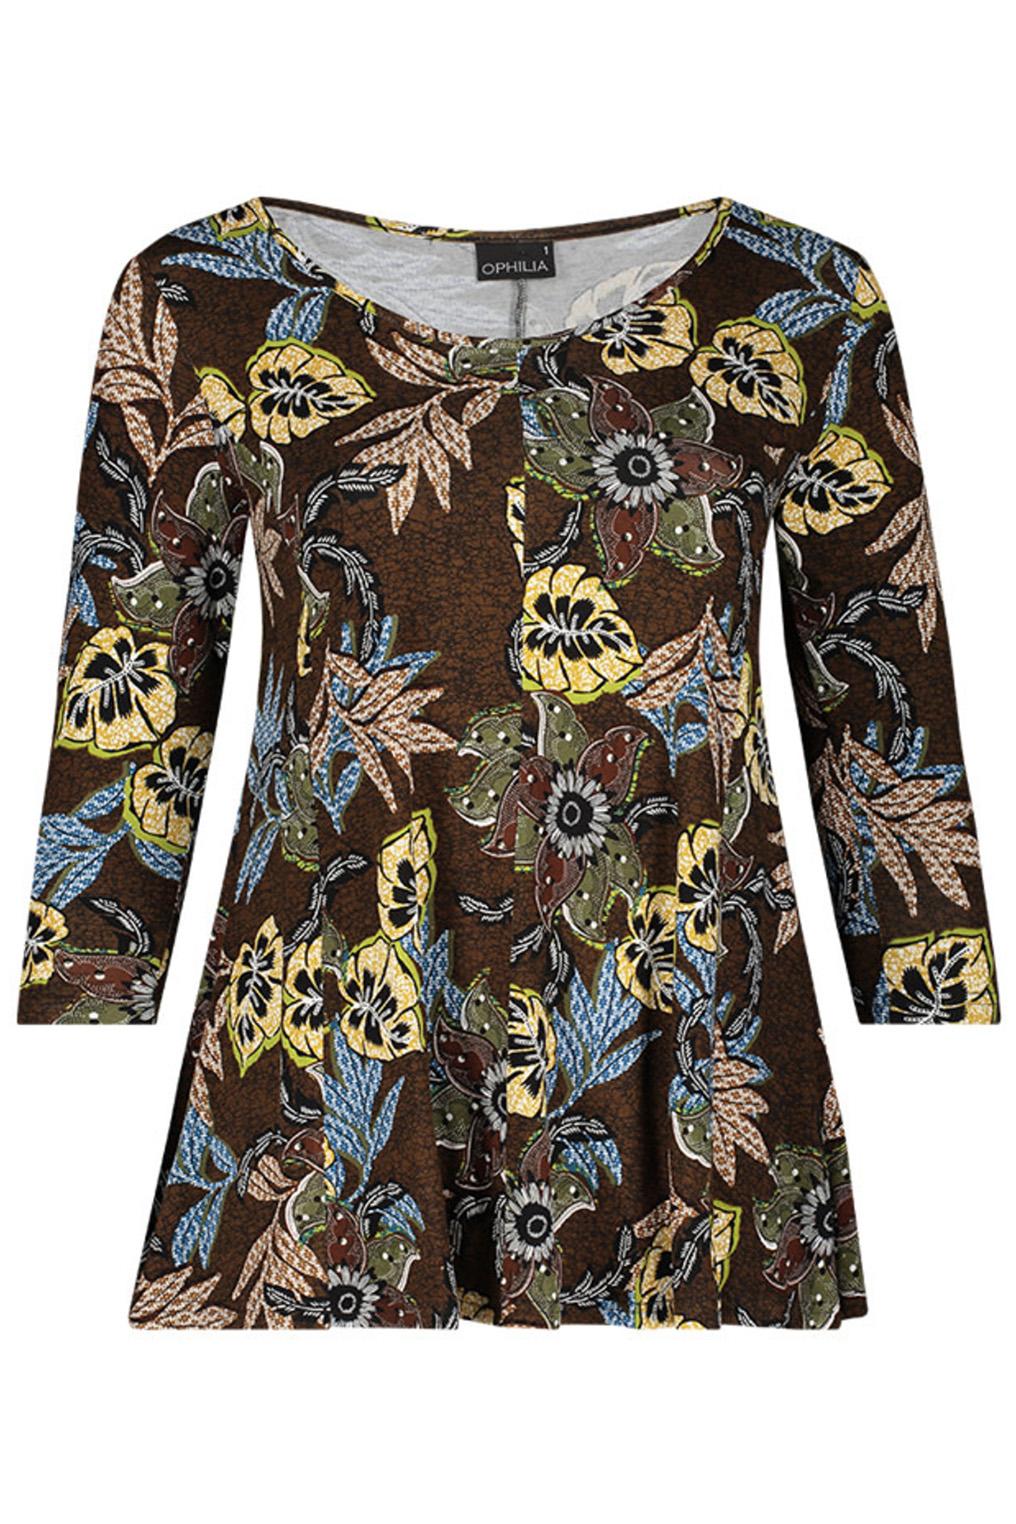 Shirt Rachel B print Ophilia